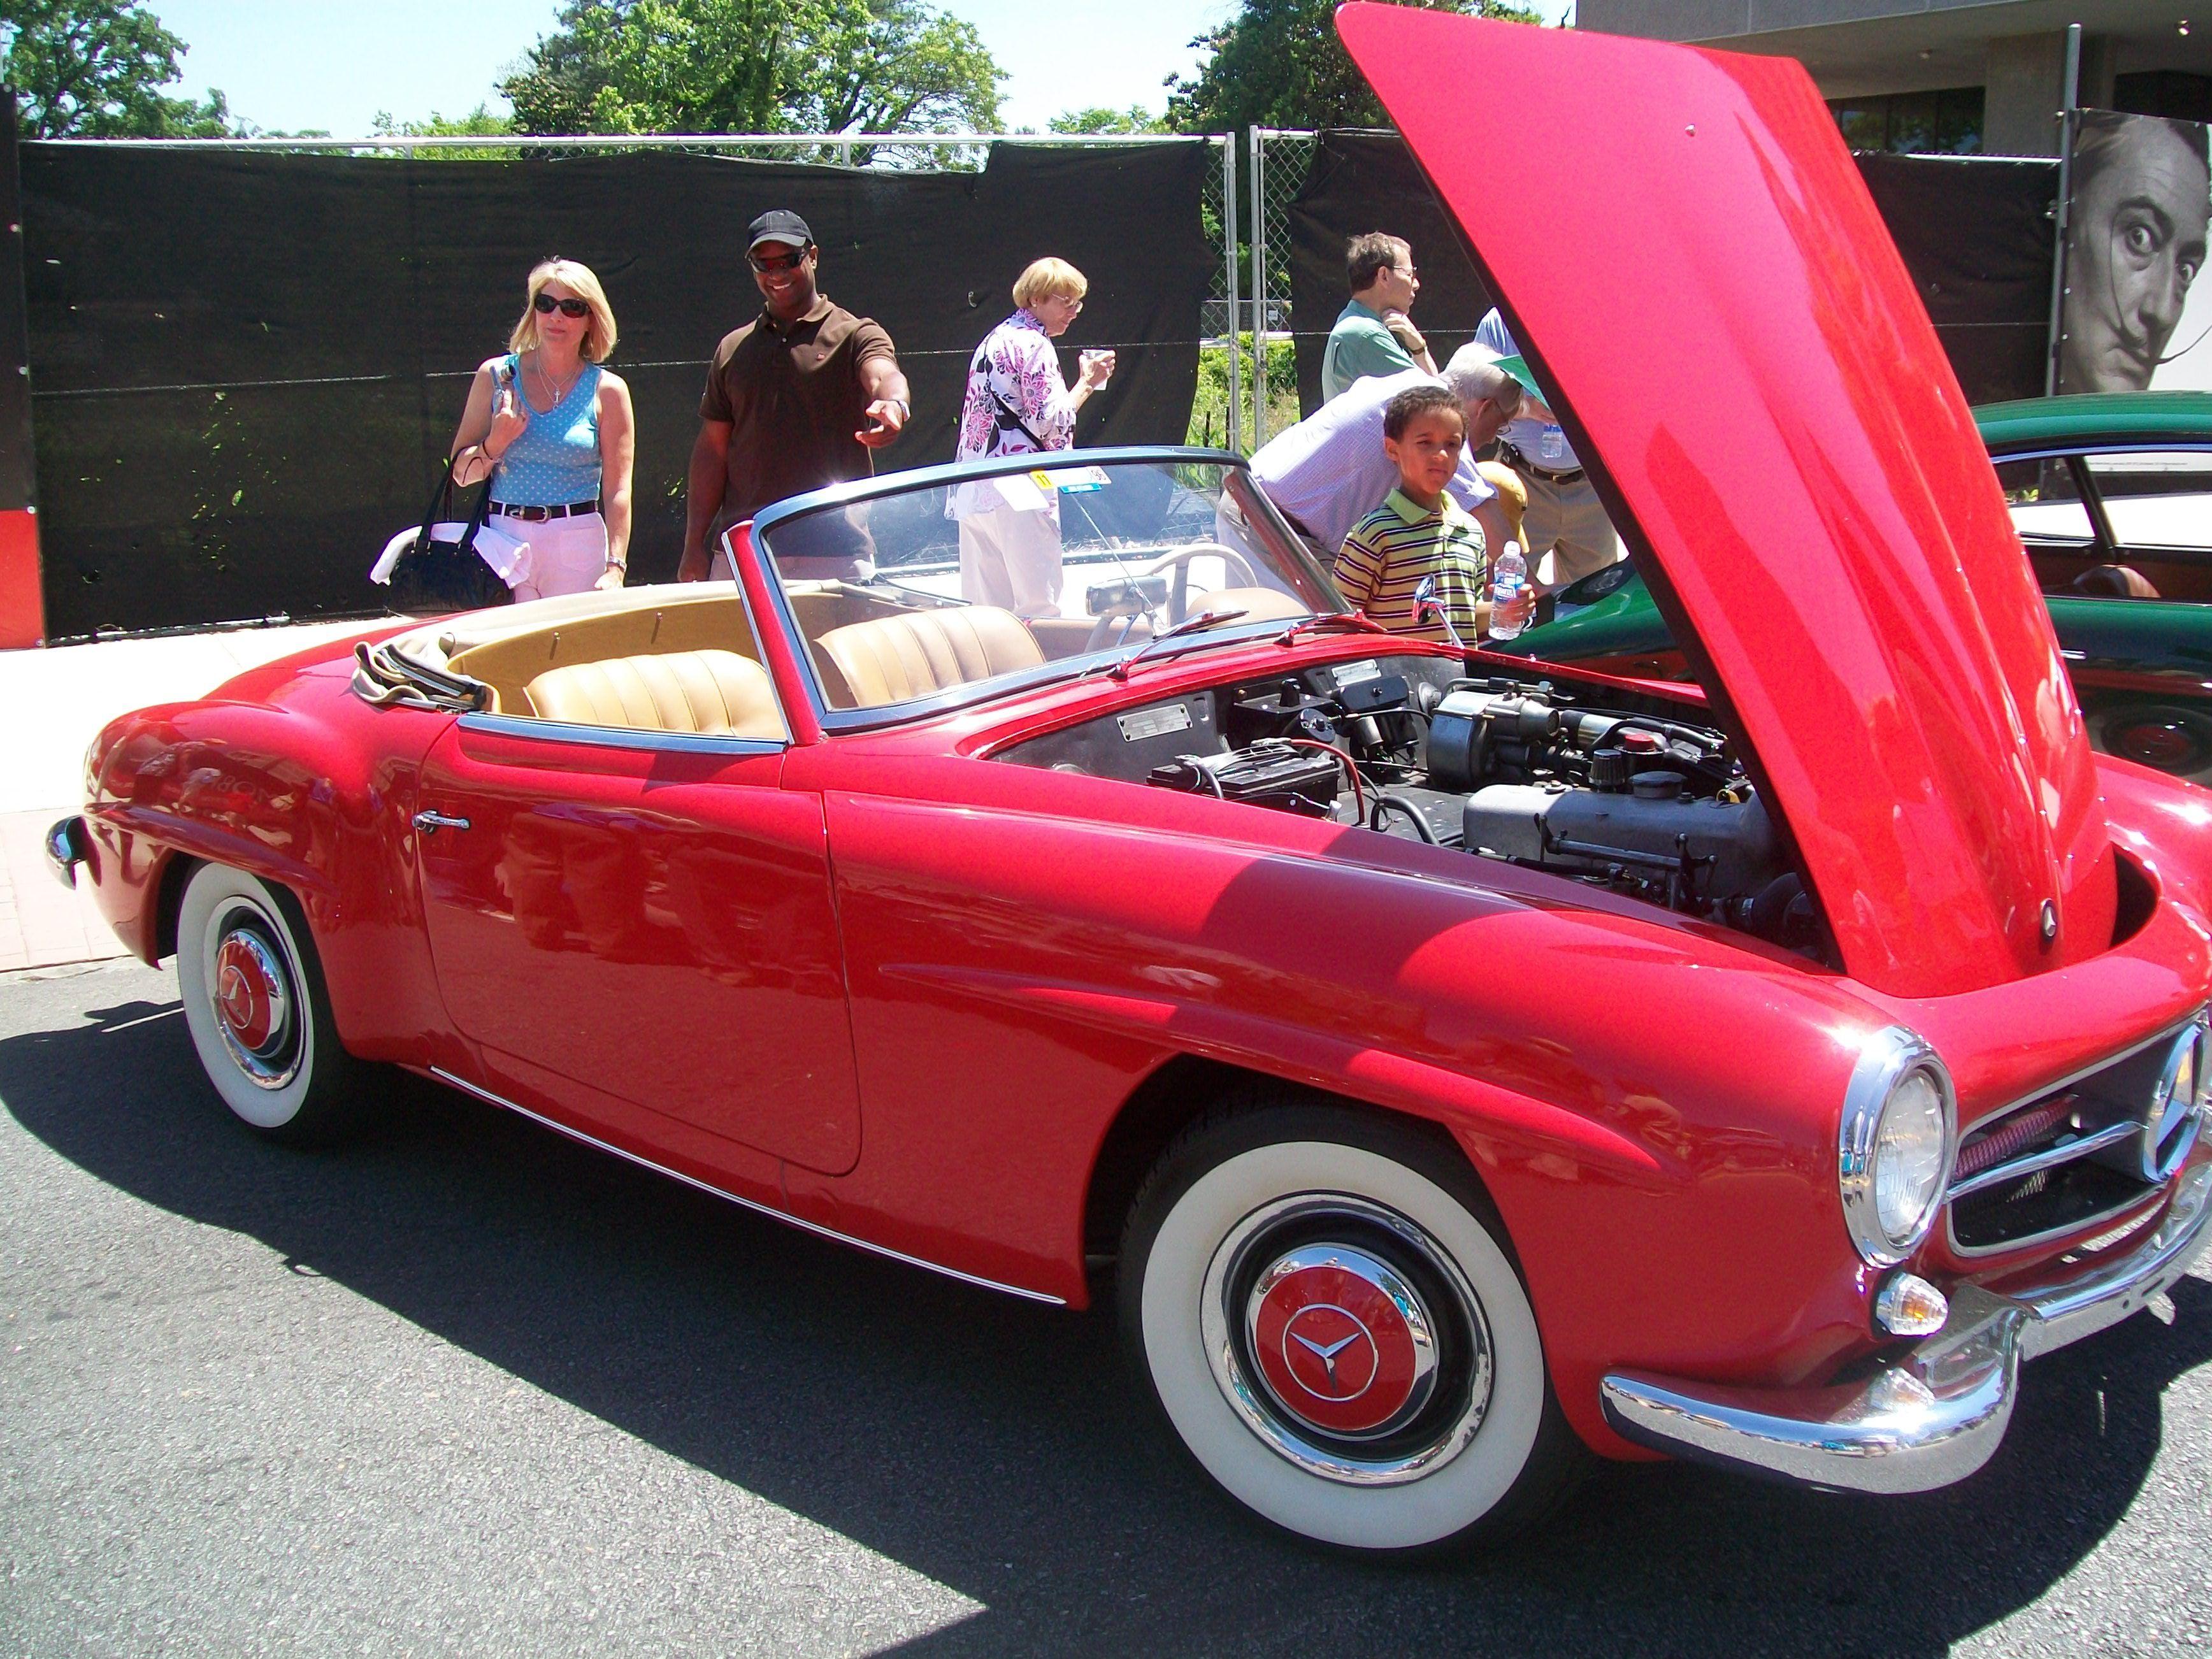 Classic Car Show At The High Atlanta Automobiles Pinterest Cars - Classic car show atlanta